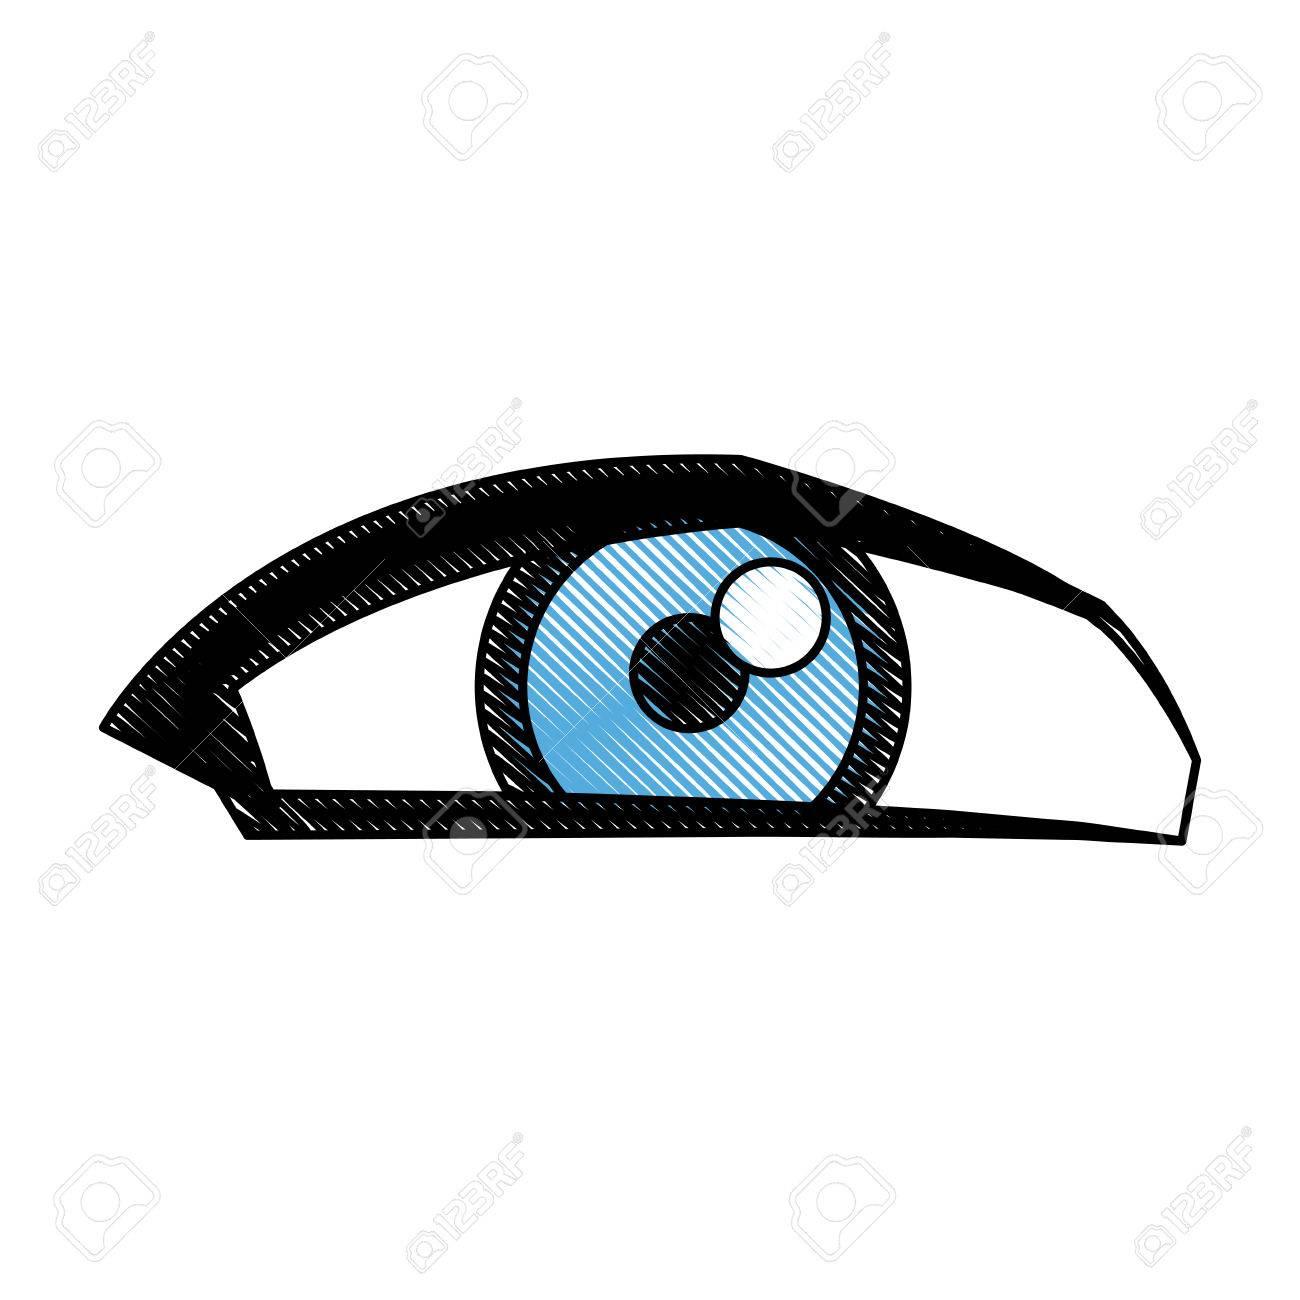 Cartoon Eye Human Look Watch Icon Vector Illustration Royalty Free Cliparts Vectors And Stock Illustration Image 78976142